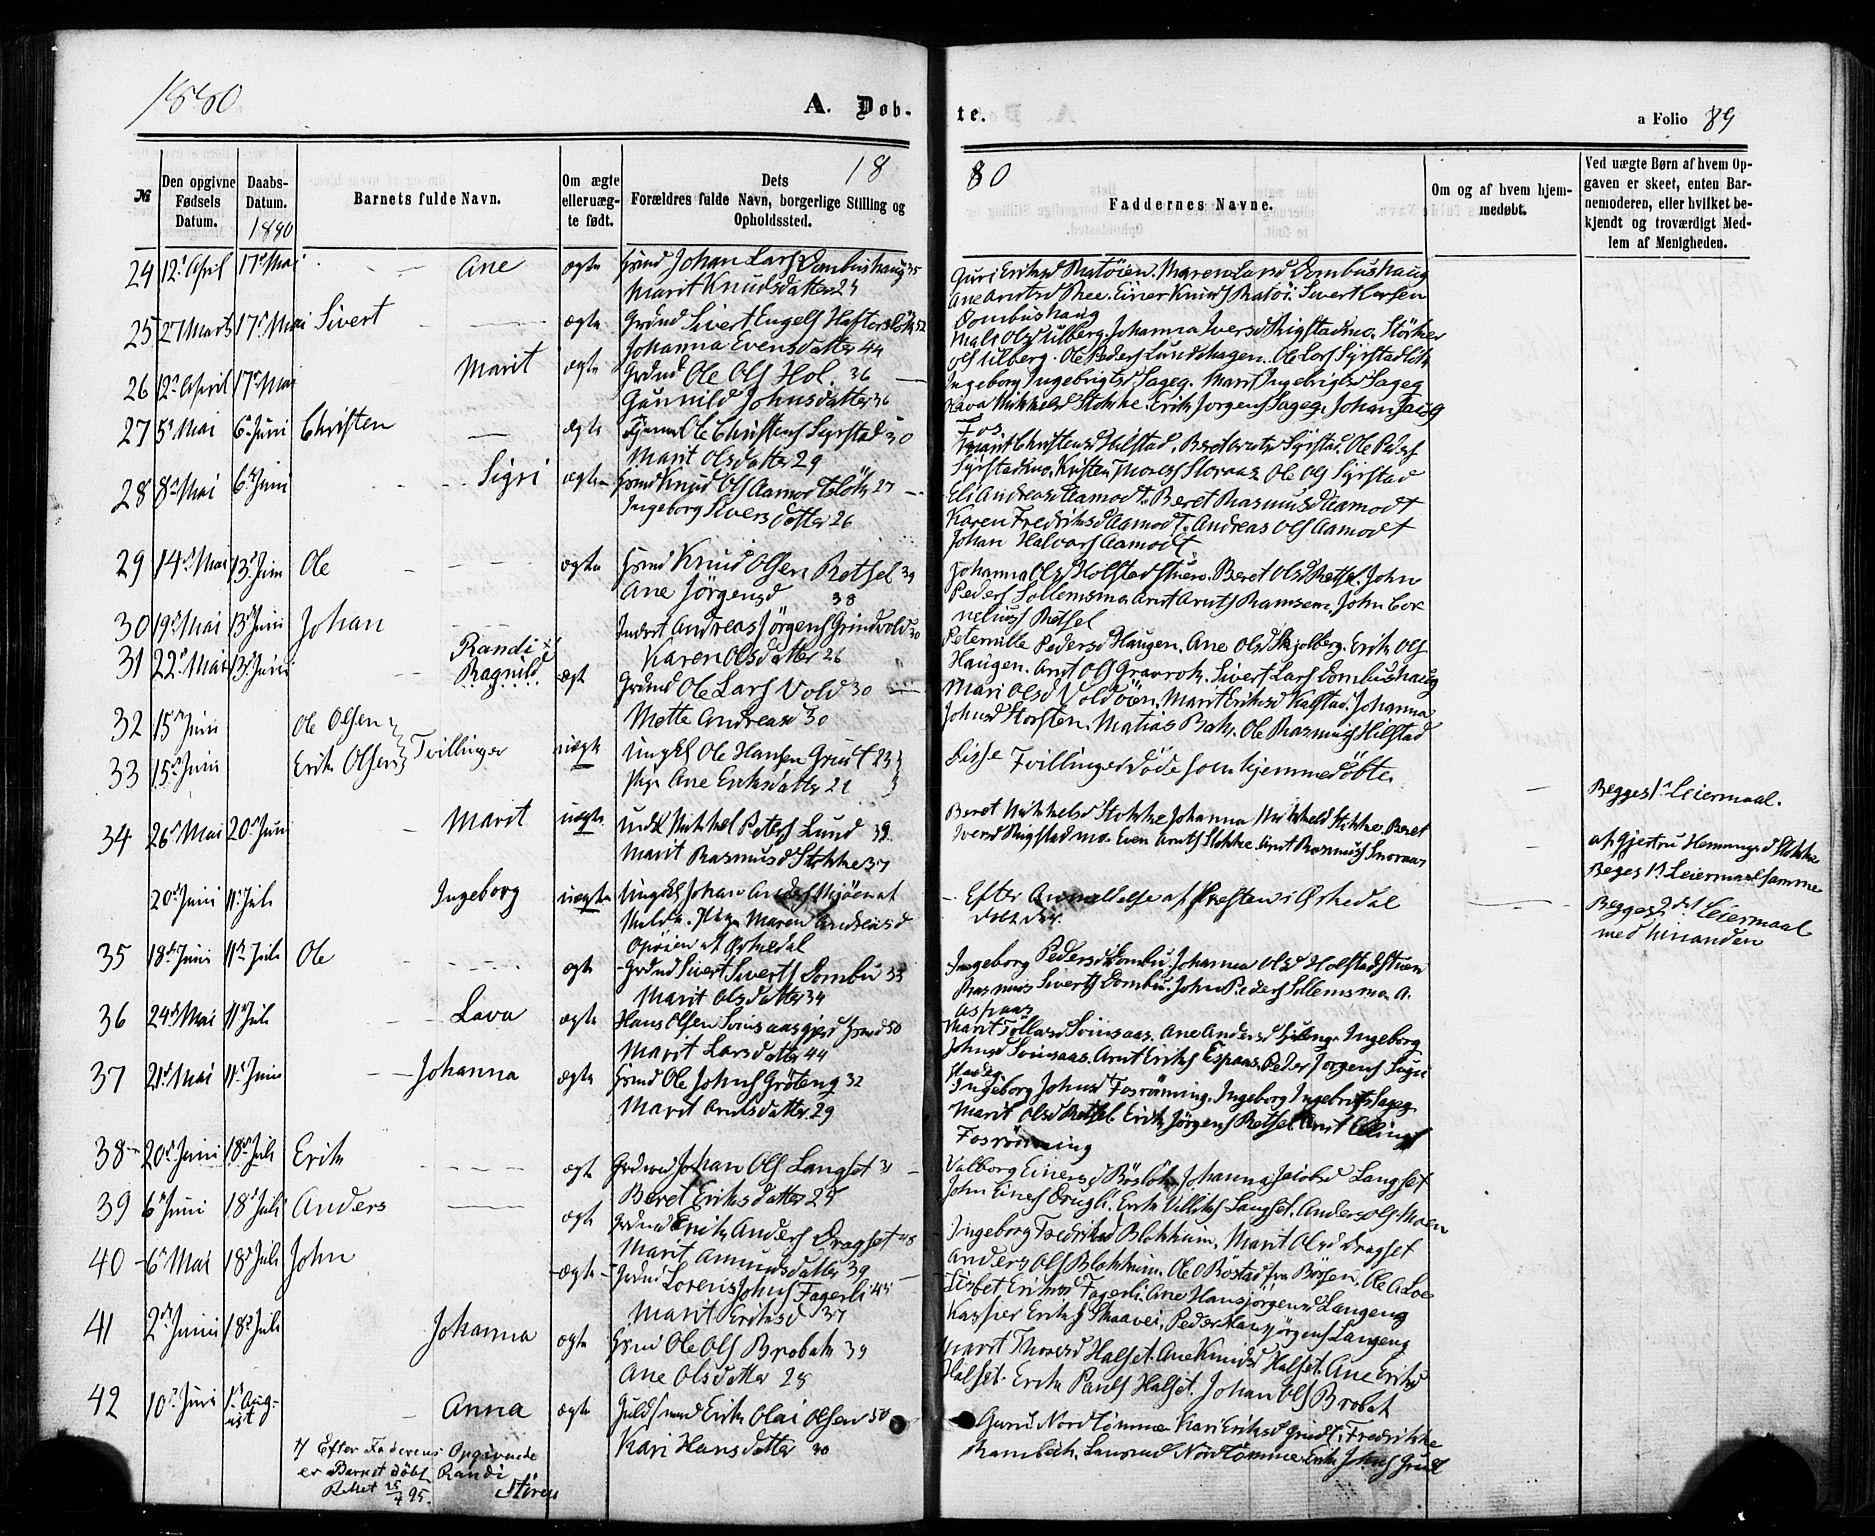 SAT, Ministerialprotokoller, klokkerbøker og fødselsregistre - Sør-Trøndelag, 672/L0856: Parish register (official) no. 672A08, 1861-1881, p. 89